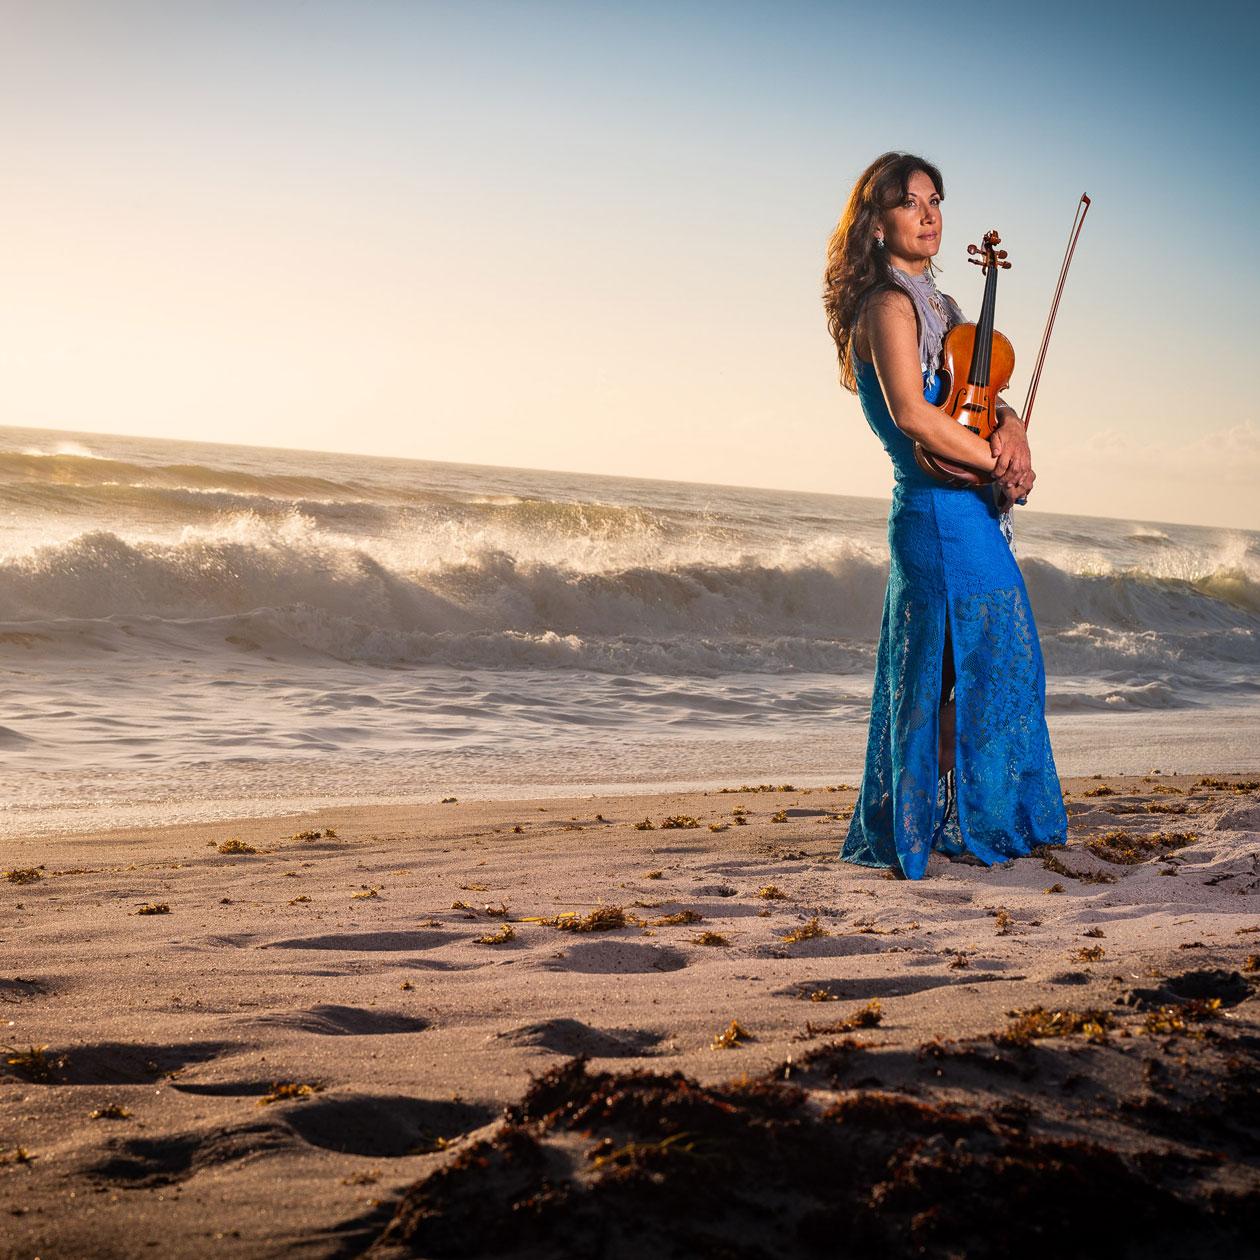 Mariana Sunset Violinist #5